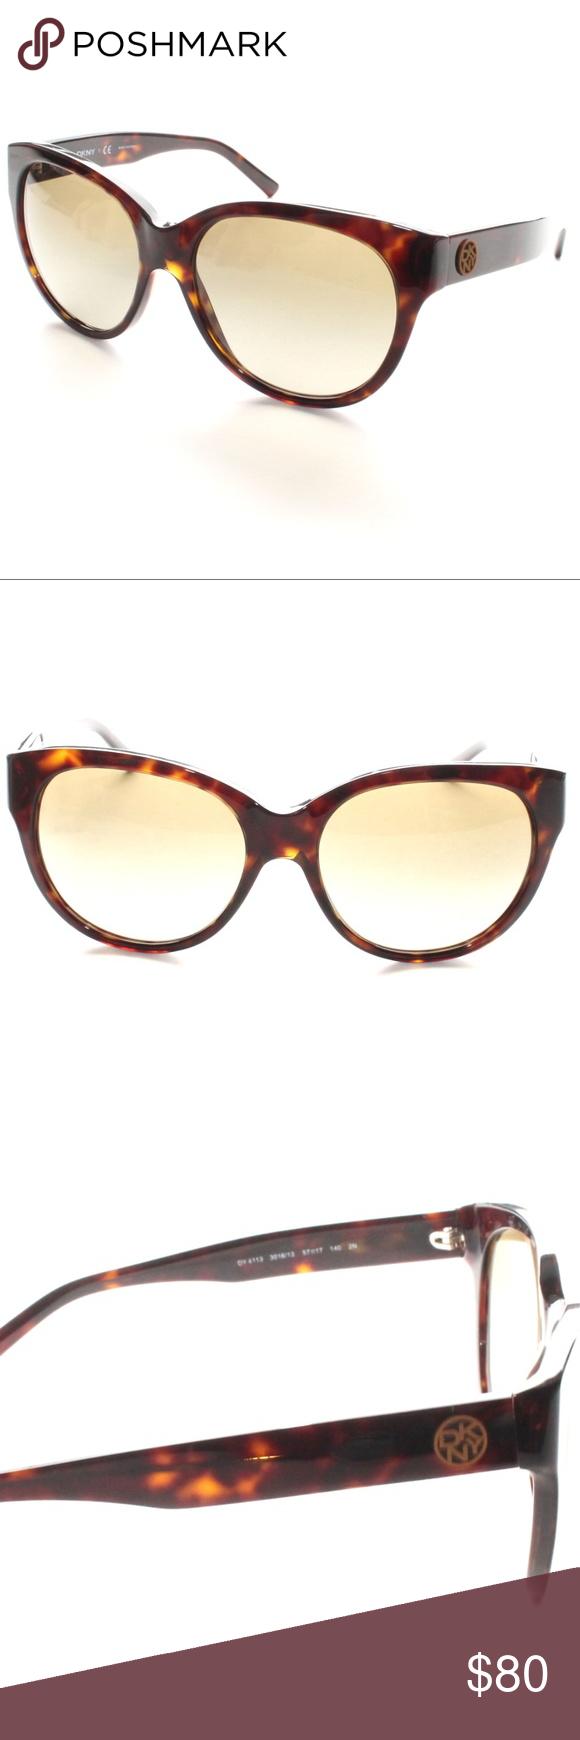 cc4c306caf67 DKNY DY 4113 3016 13 Brown Round Sunglasses